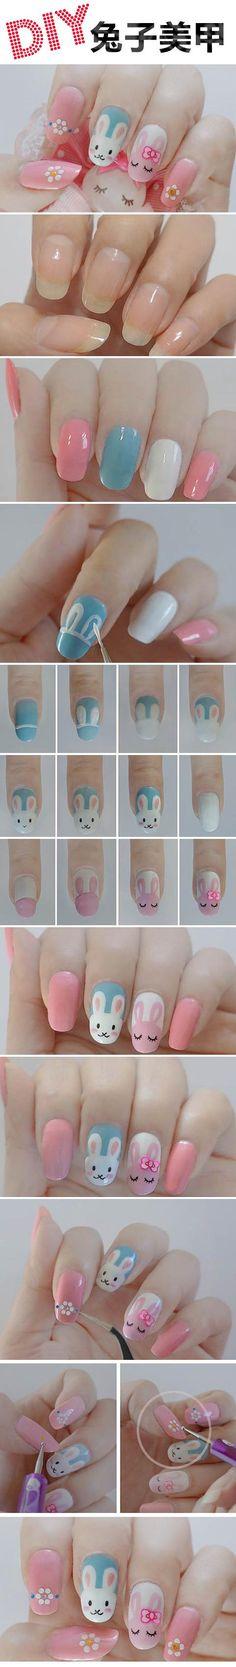 Cute Rabbit Nail Design Tutorials #nails #nail art design